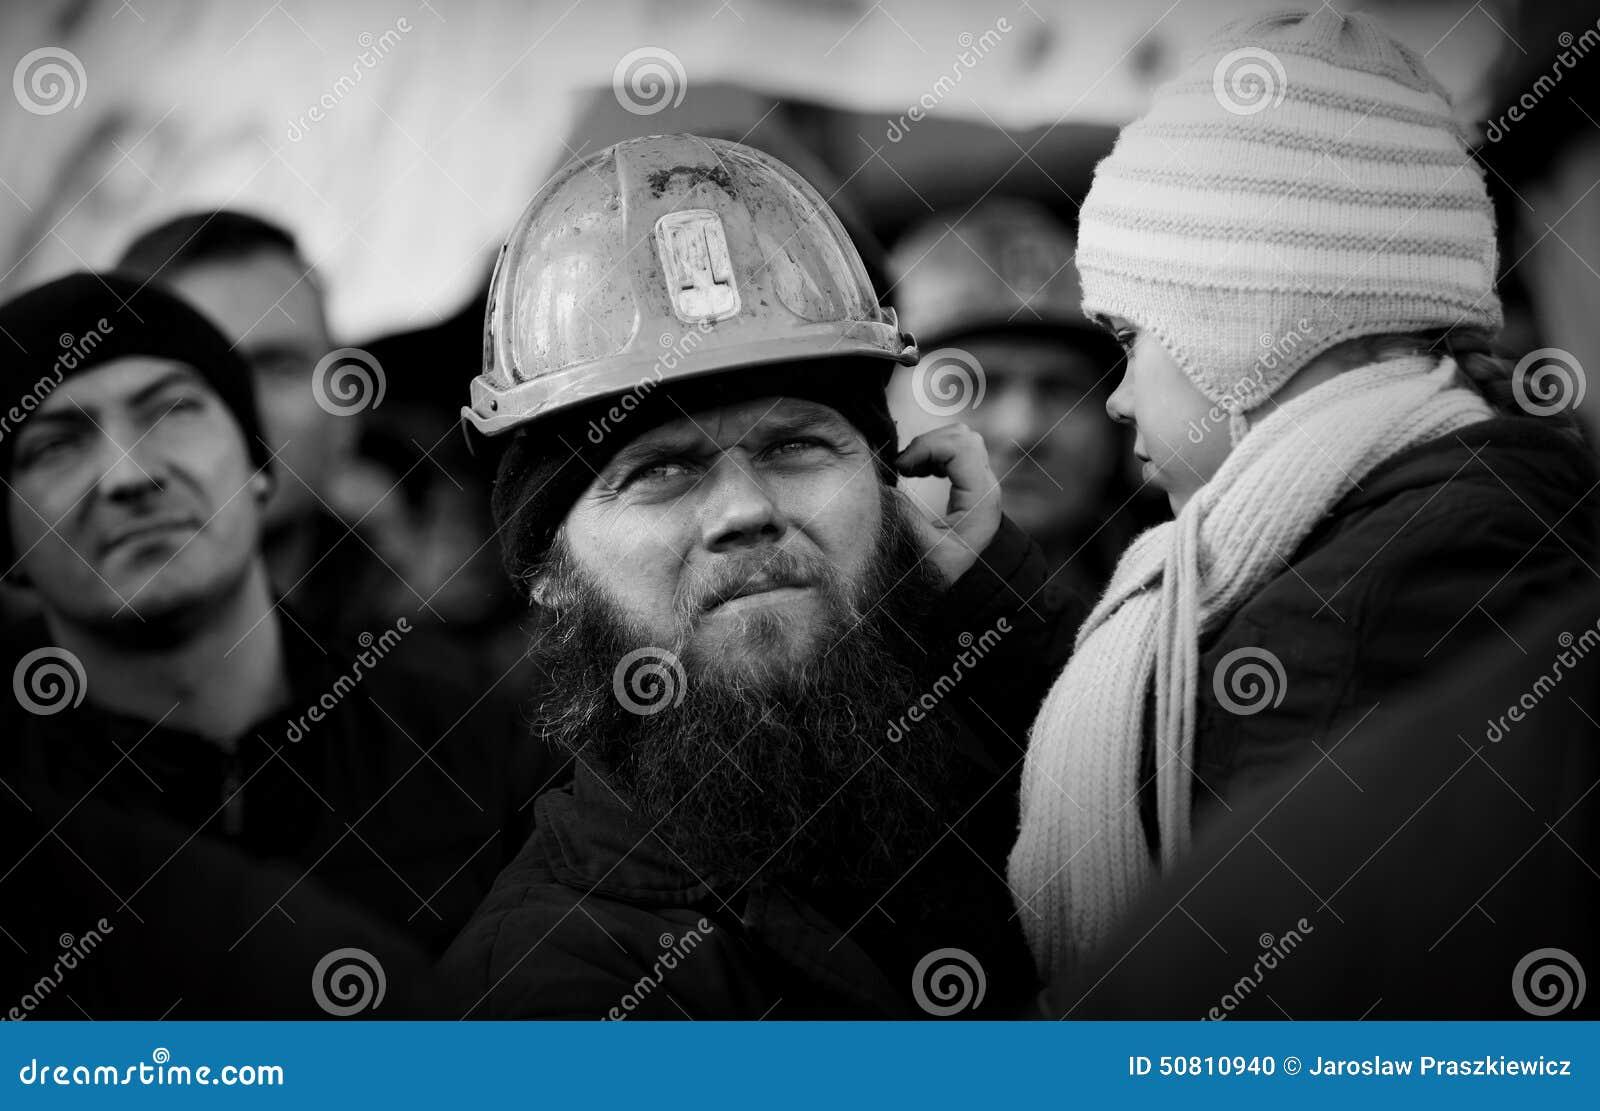 Протест Действи- забастовки силезских горнорабочих